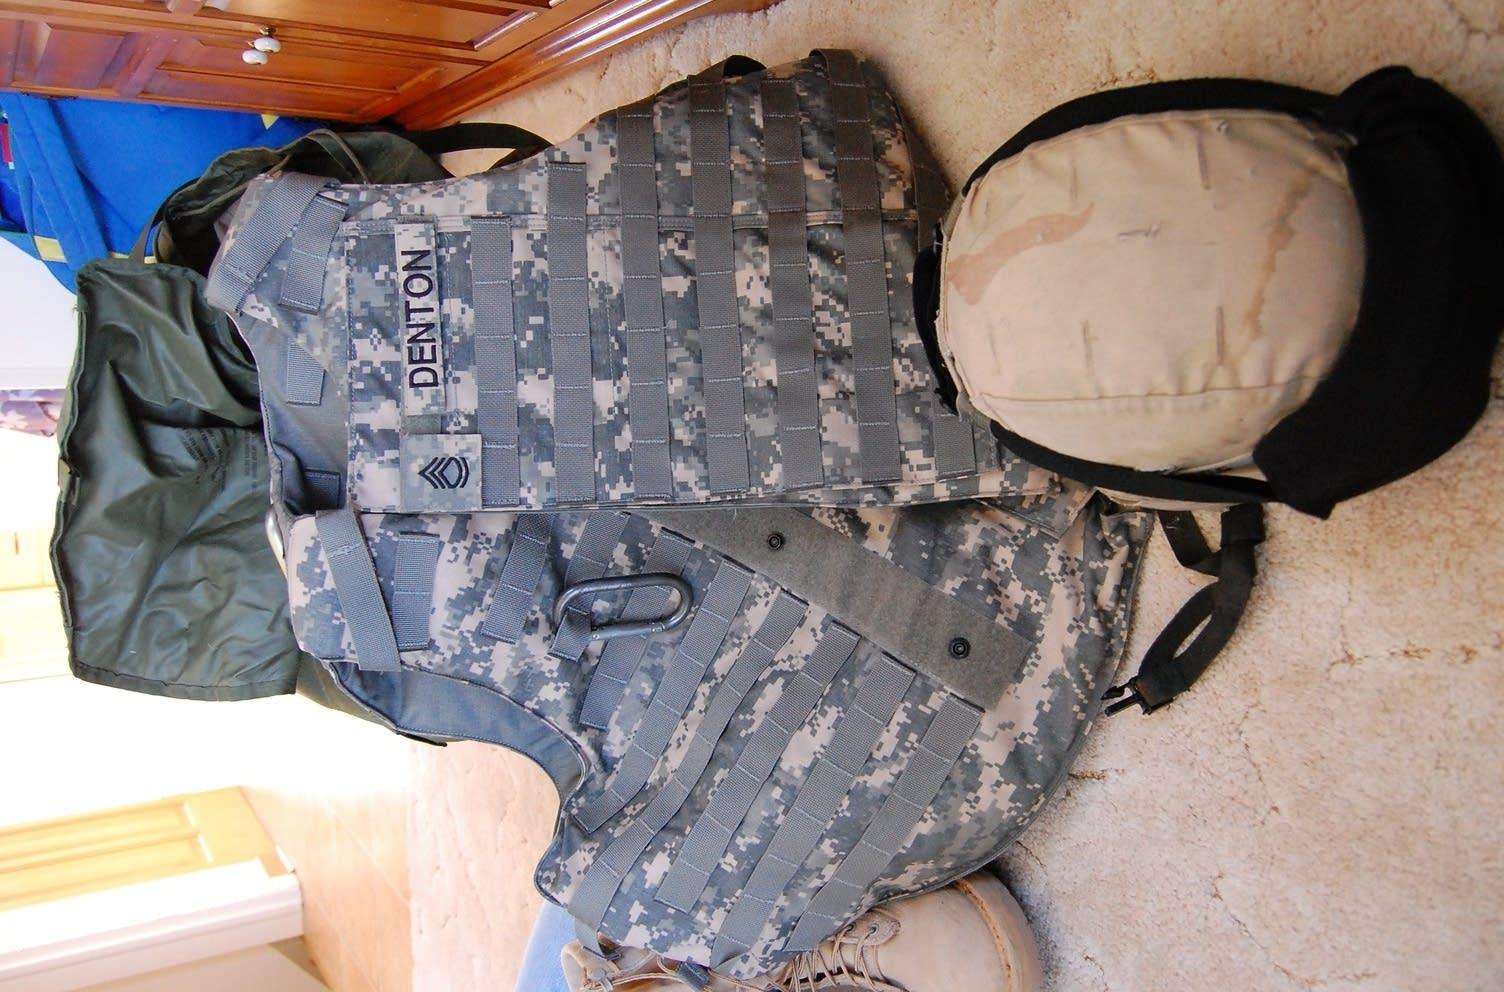 Sgt. Denton's rucksack